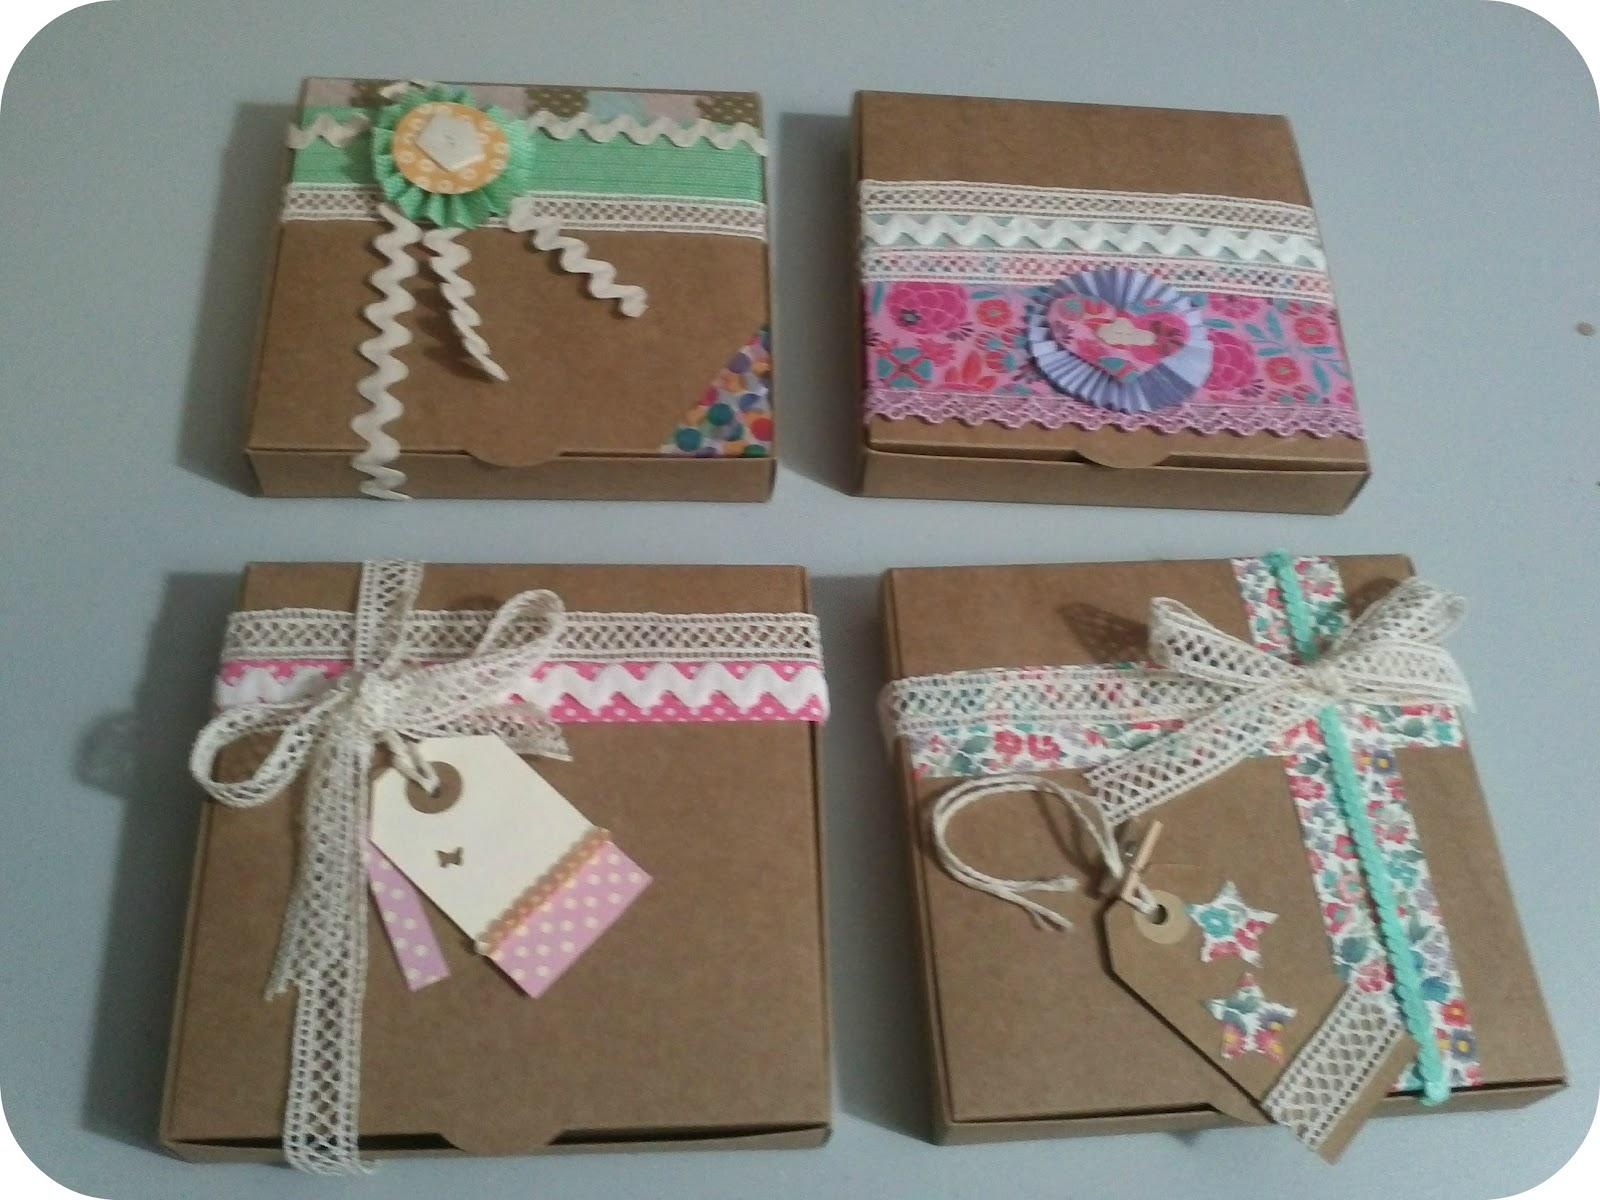 Creando ardiles taller empaquetado - Empaquetado de regalos ...